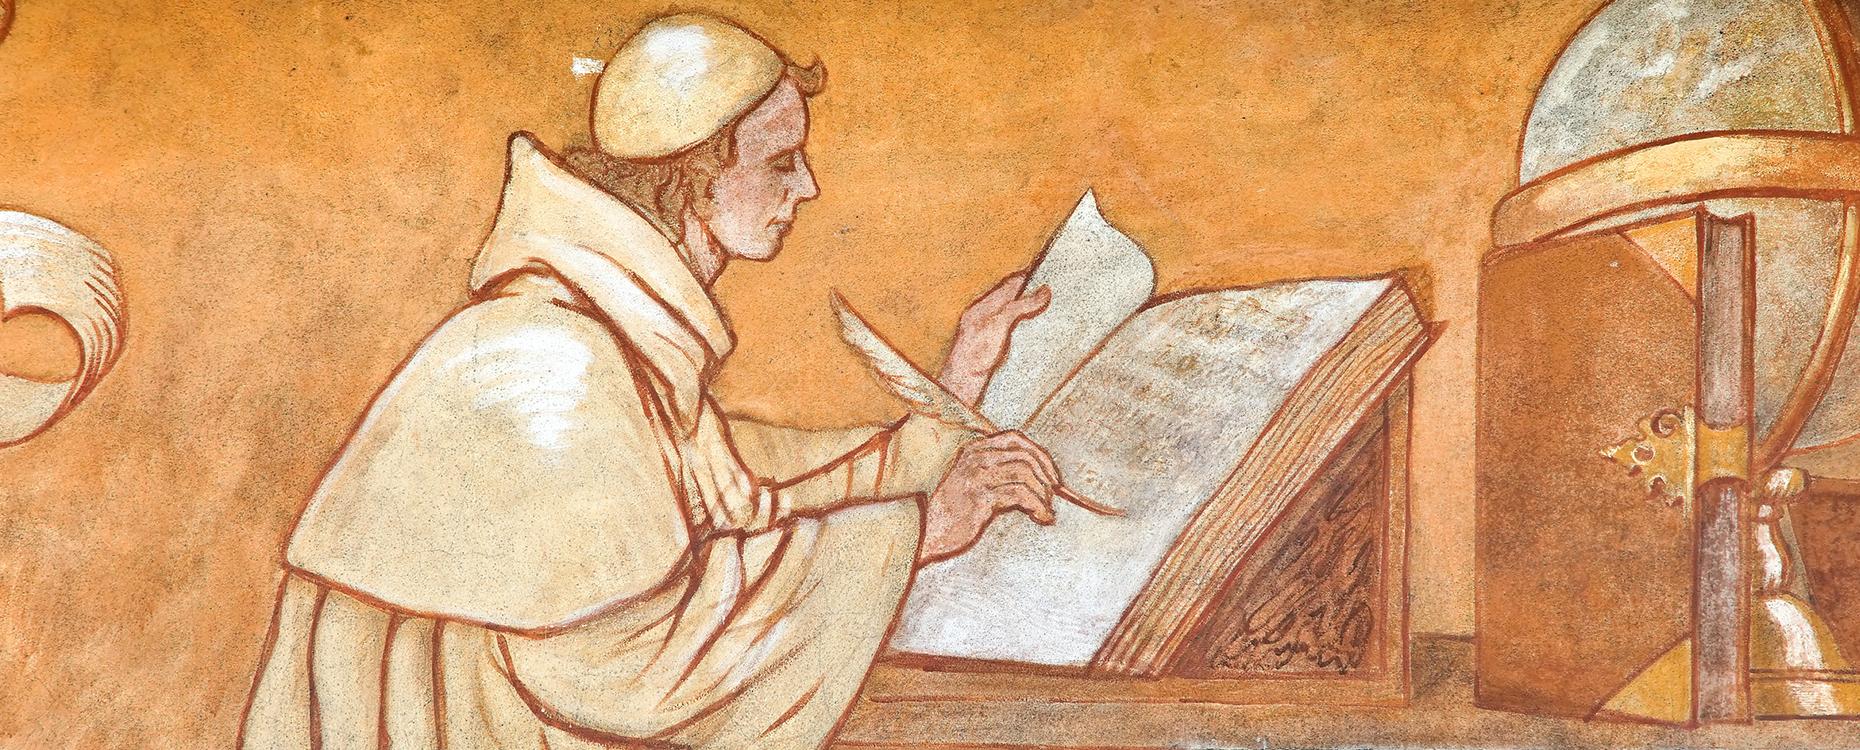 Histoire-ecriture-atelier-stabilo-1860x750px.jpg